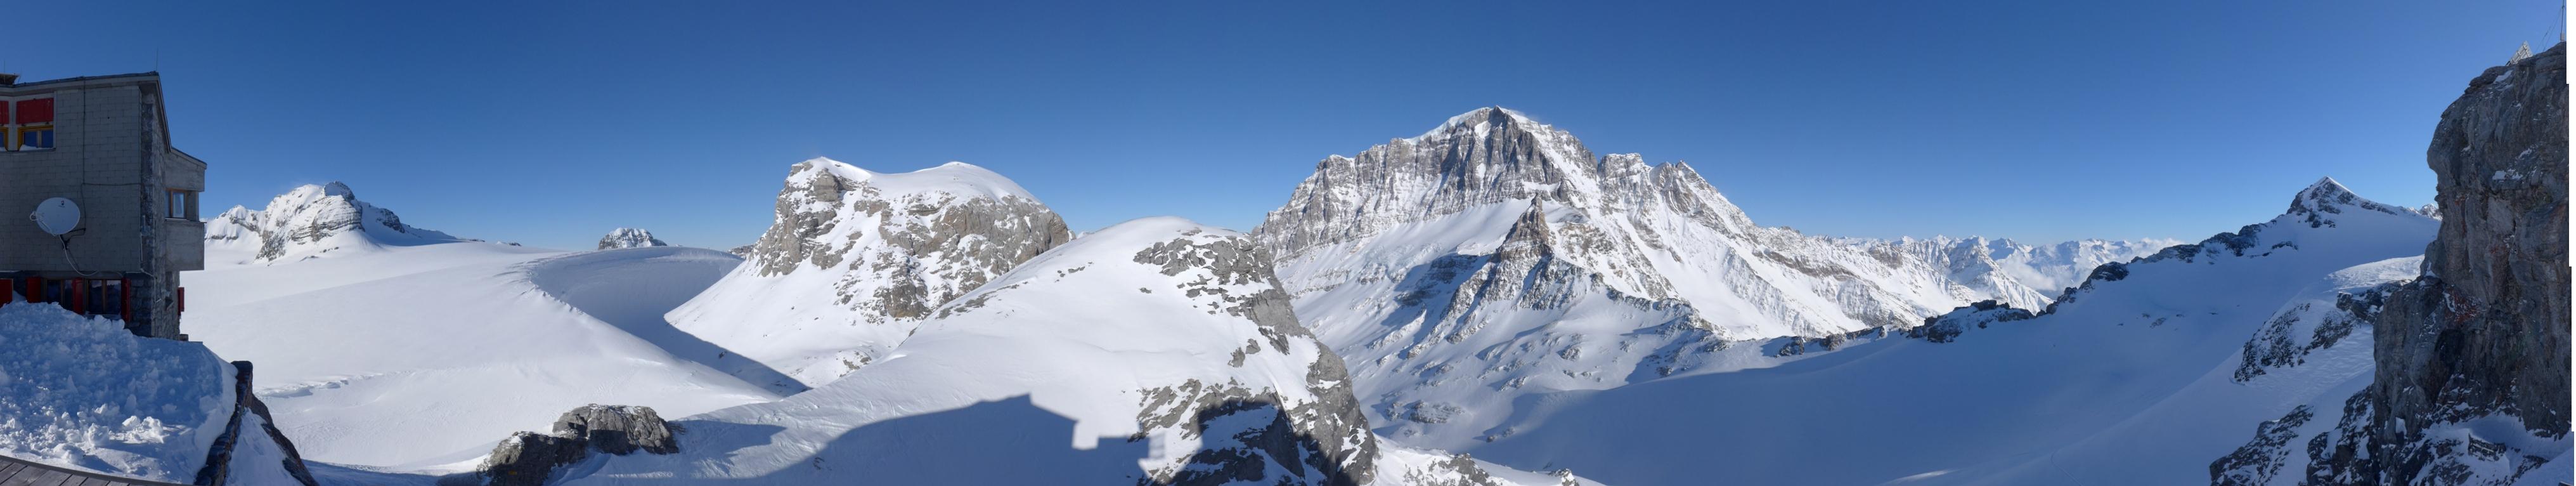 Clariden S, from Planurahütte Glarner Alpen Switzerland panorama 23